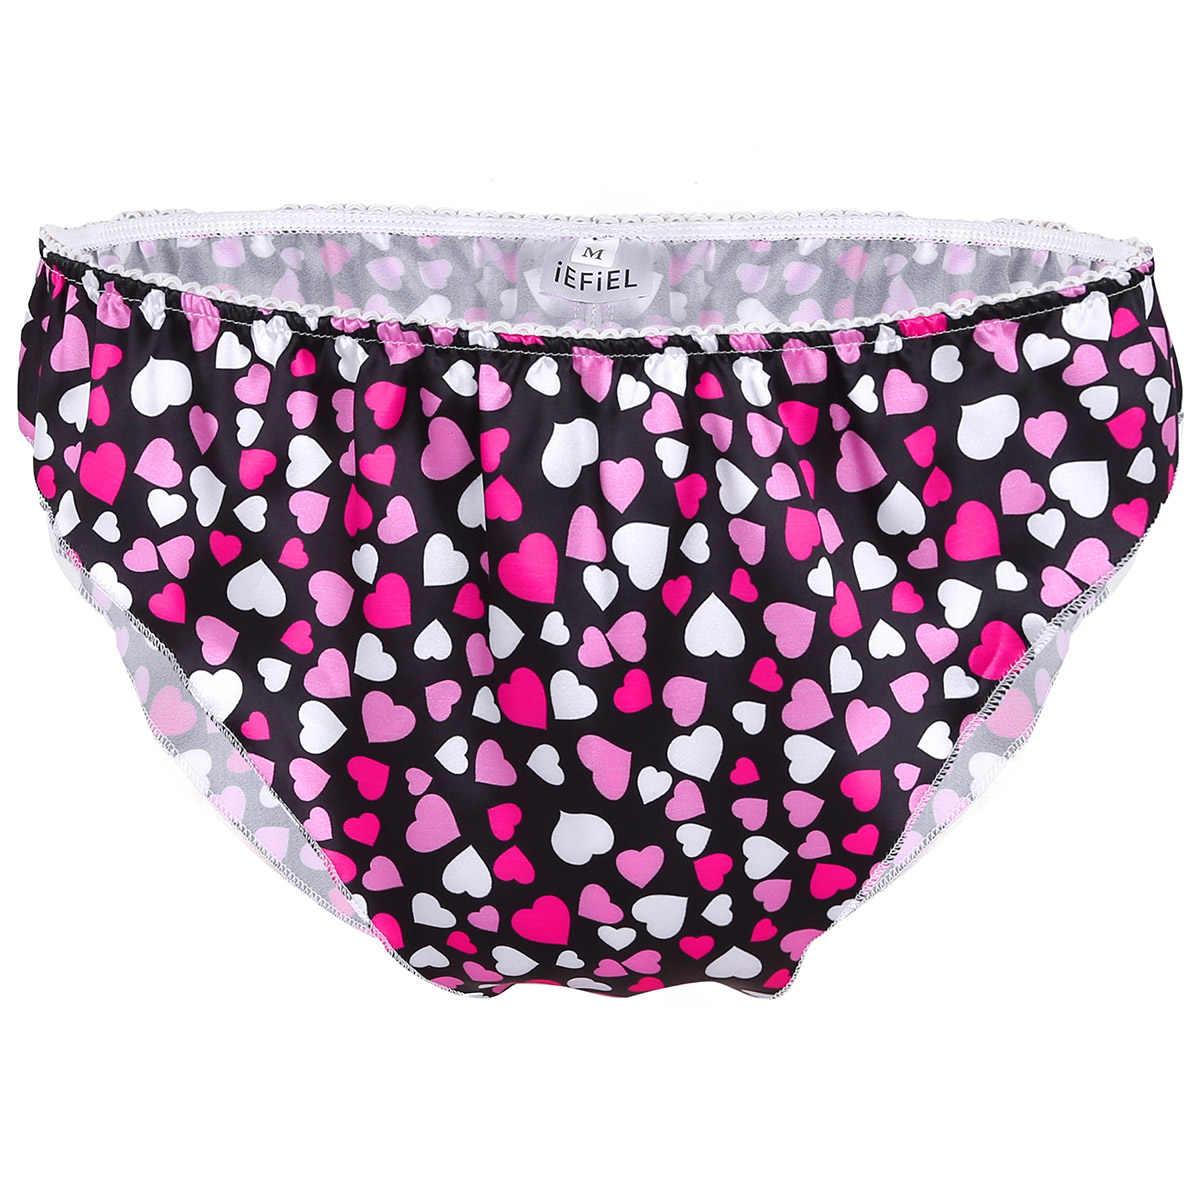 af9108e4d612 ... Mens Love Heart Soft Satin Briefs High Quality Sexy Bikini Underwear  Penis Pouch Underwear Men Lingerie ...